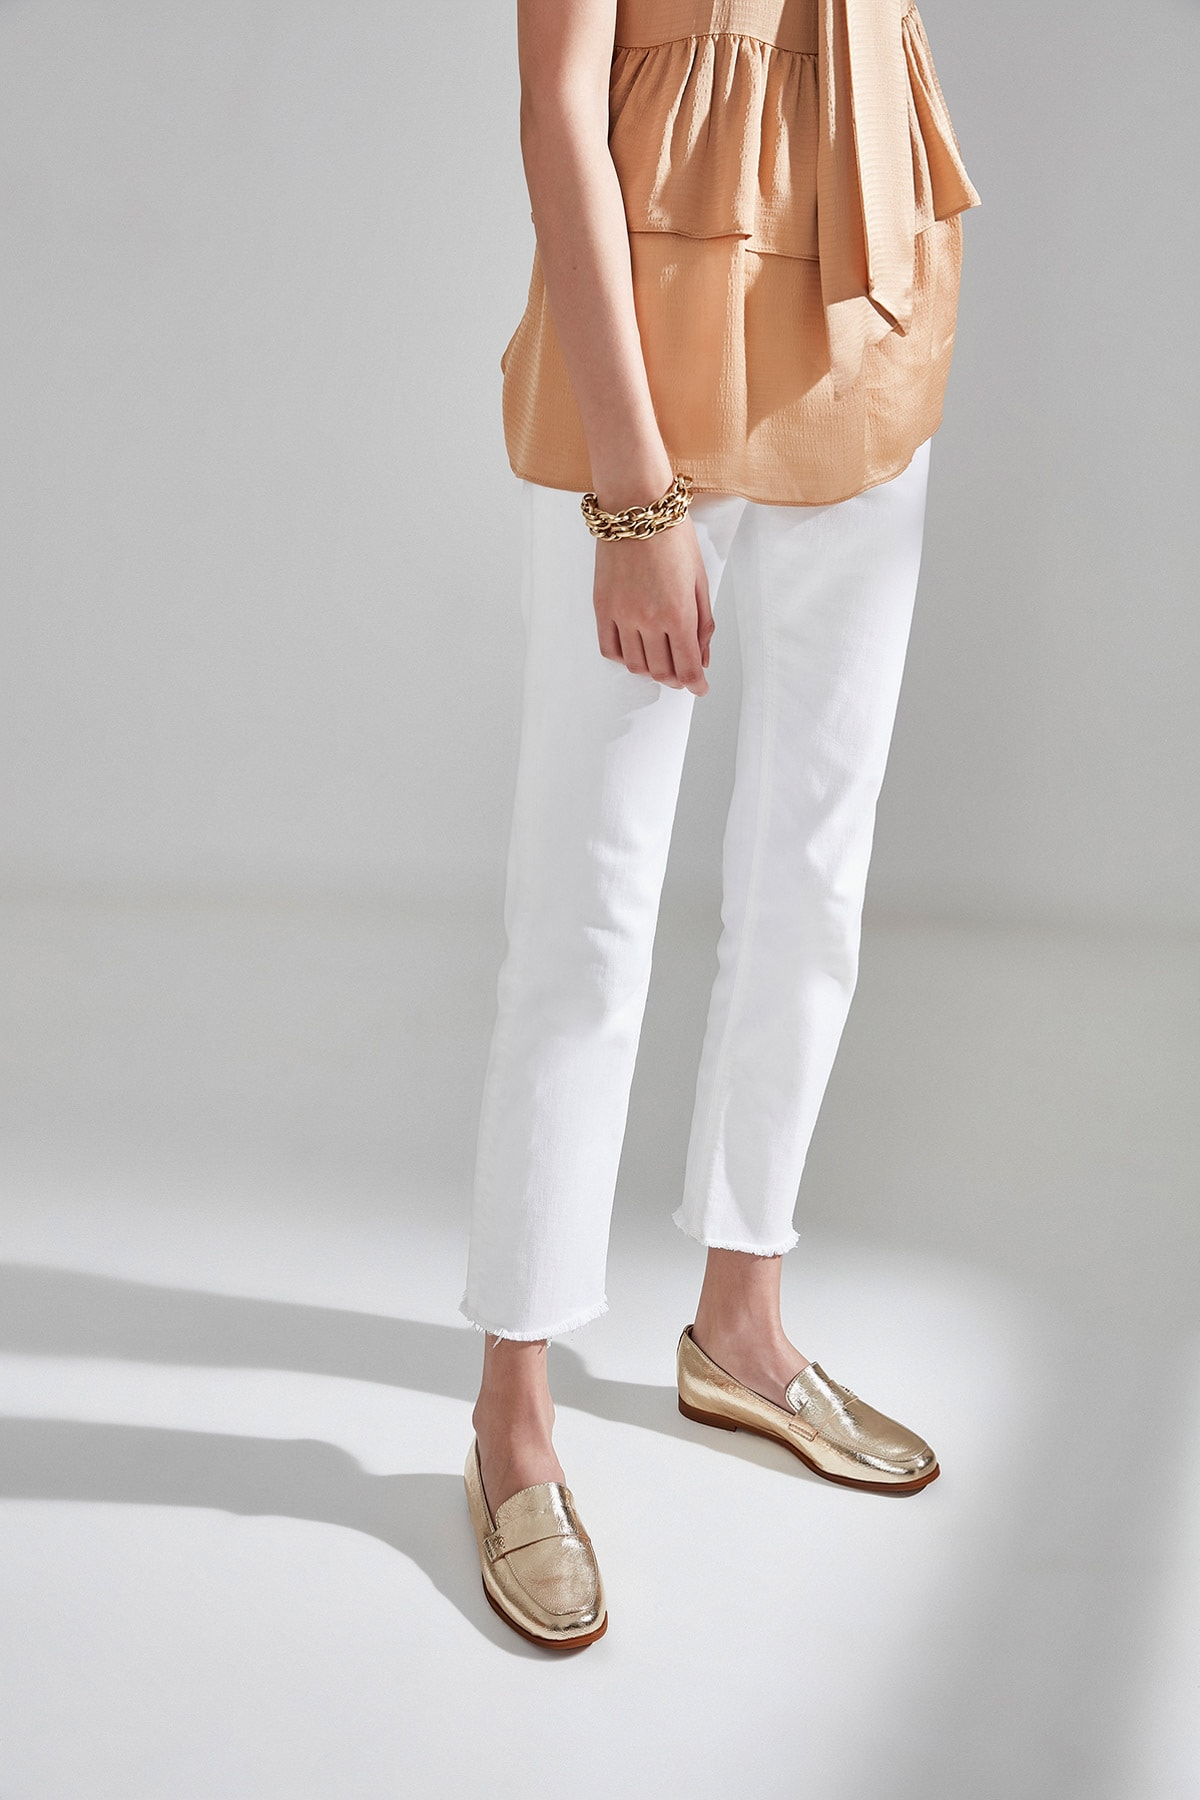 Hotiç Gold Kadın Loafer Ayakkabı 01AYH174500A540 1